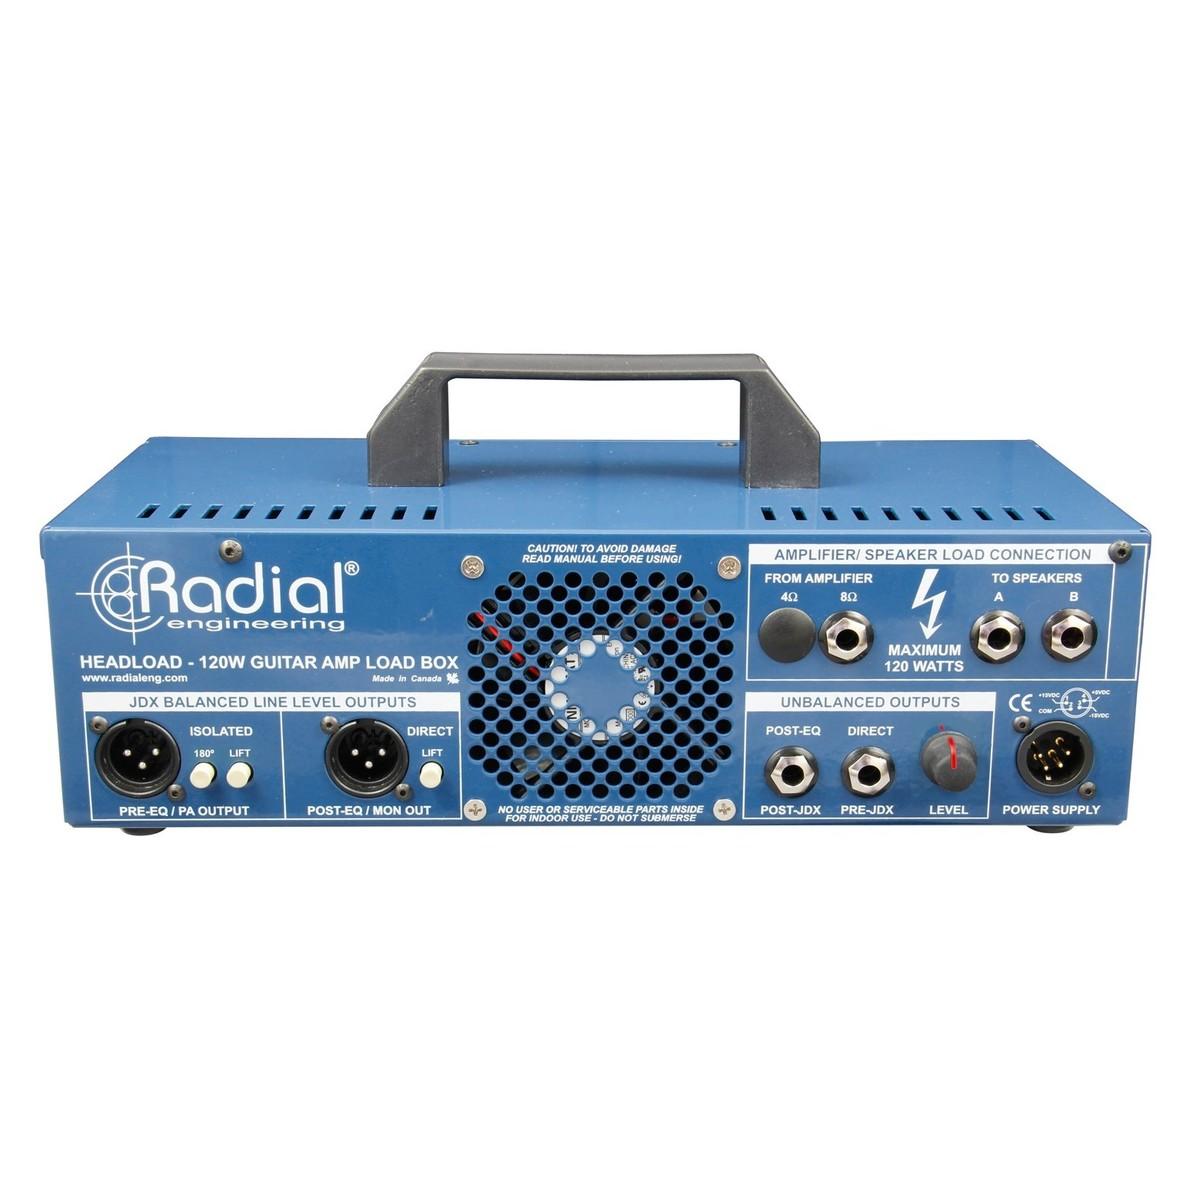 radial tonebone headload v8 guitar amp load box at gear4music. Black Bedroom Furniture Sets. Home Design Ideas